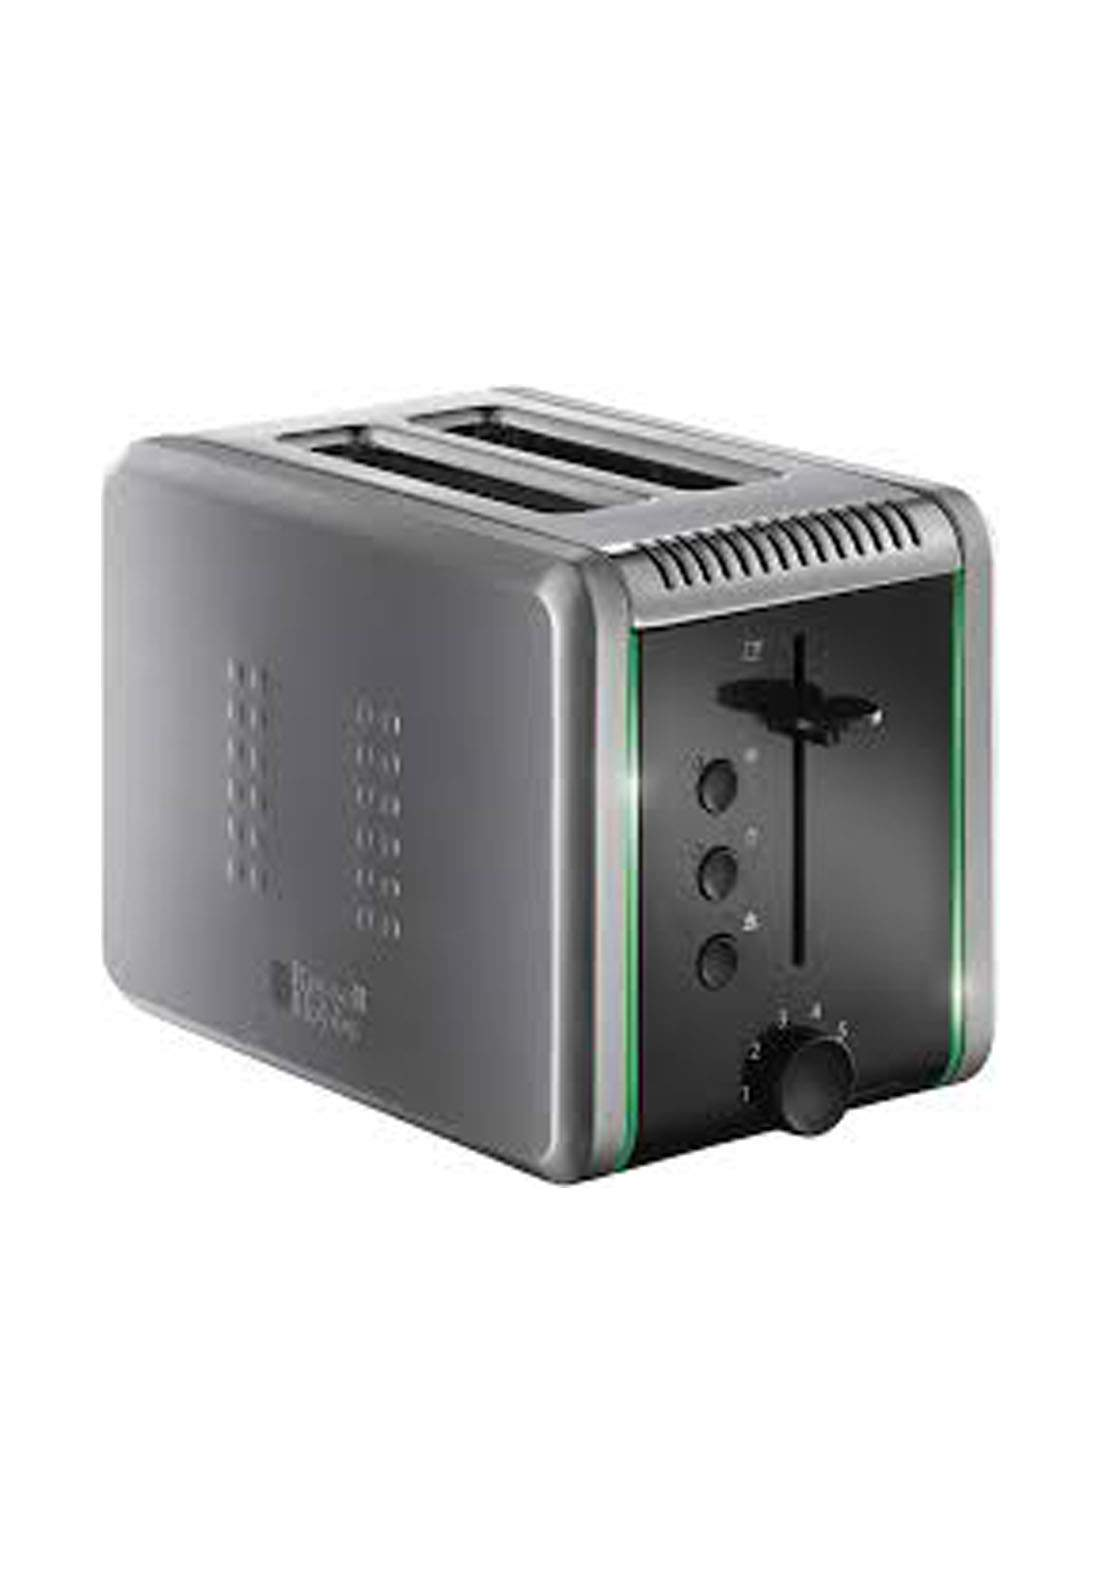 Russell hobbs 20170  Toaster   تويستر